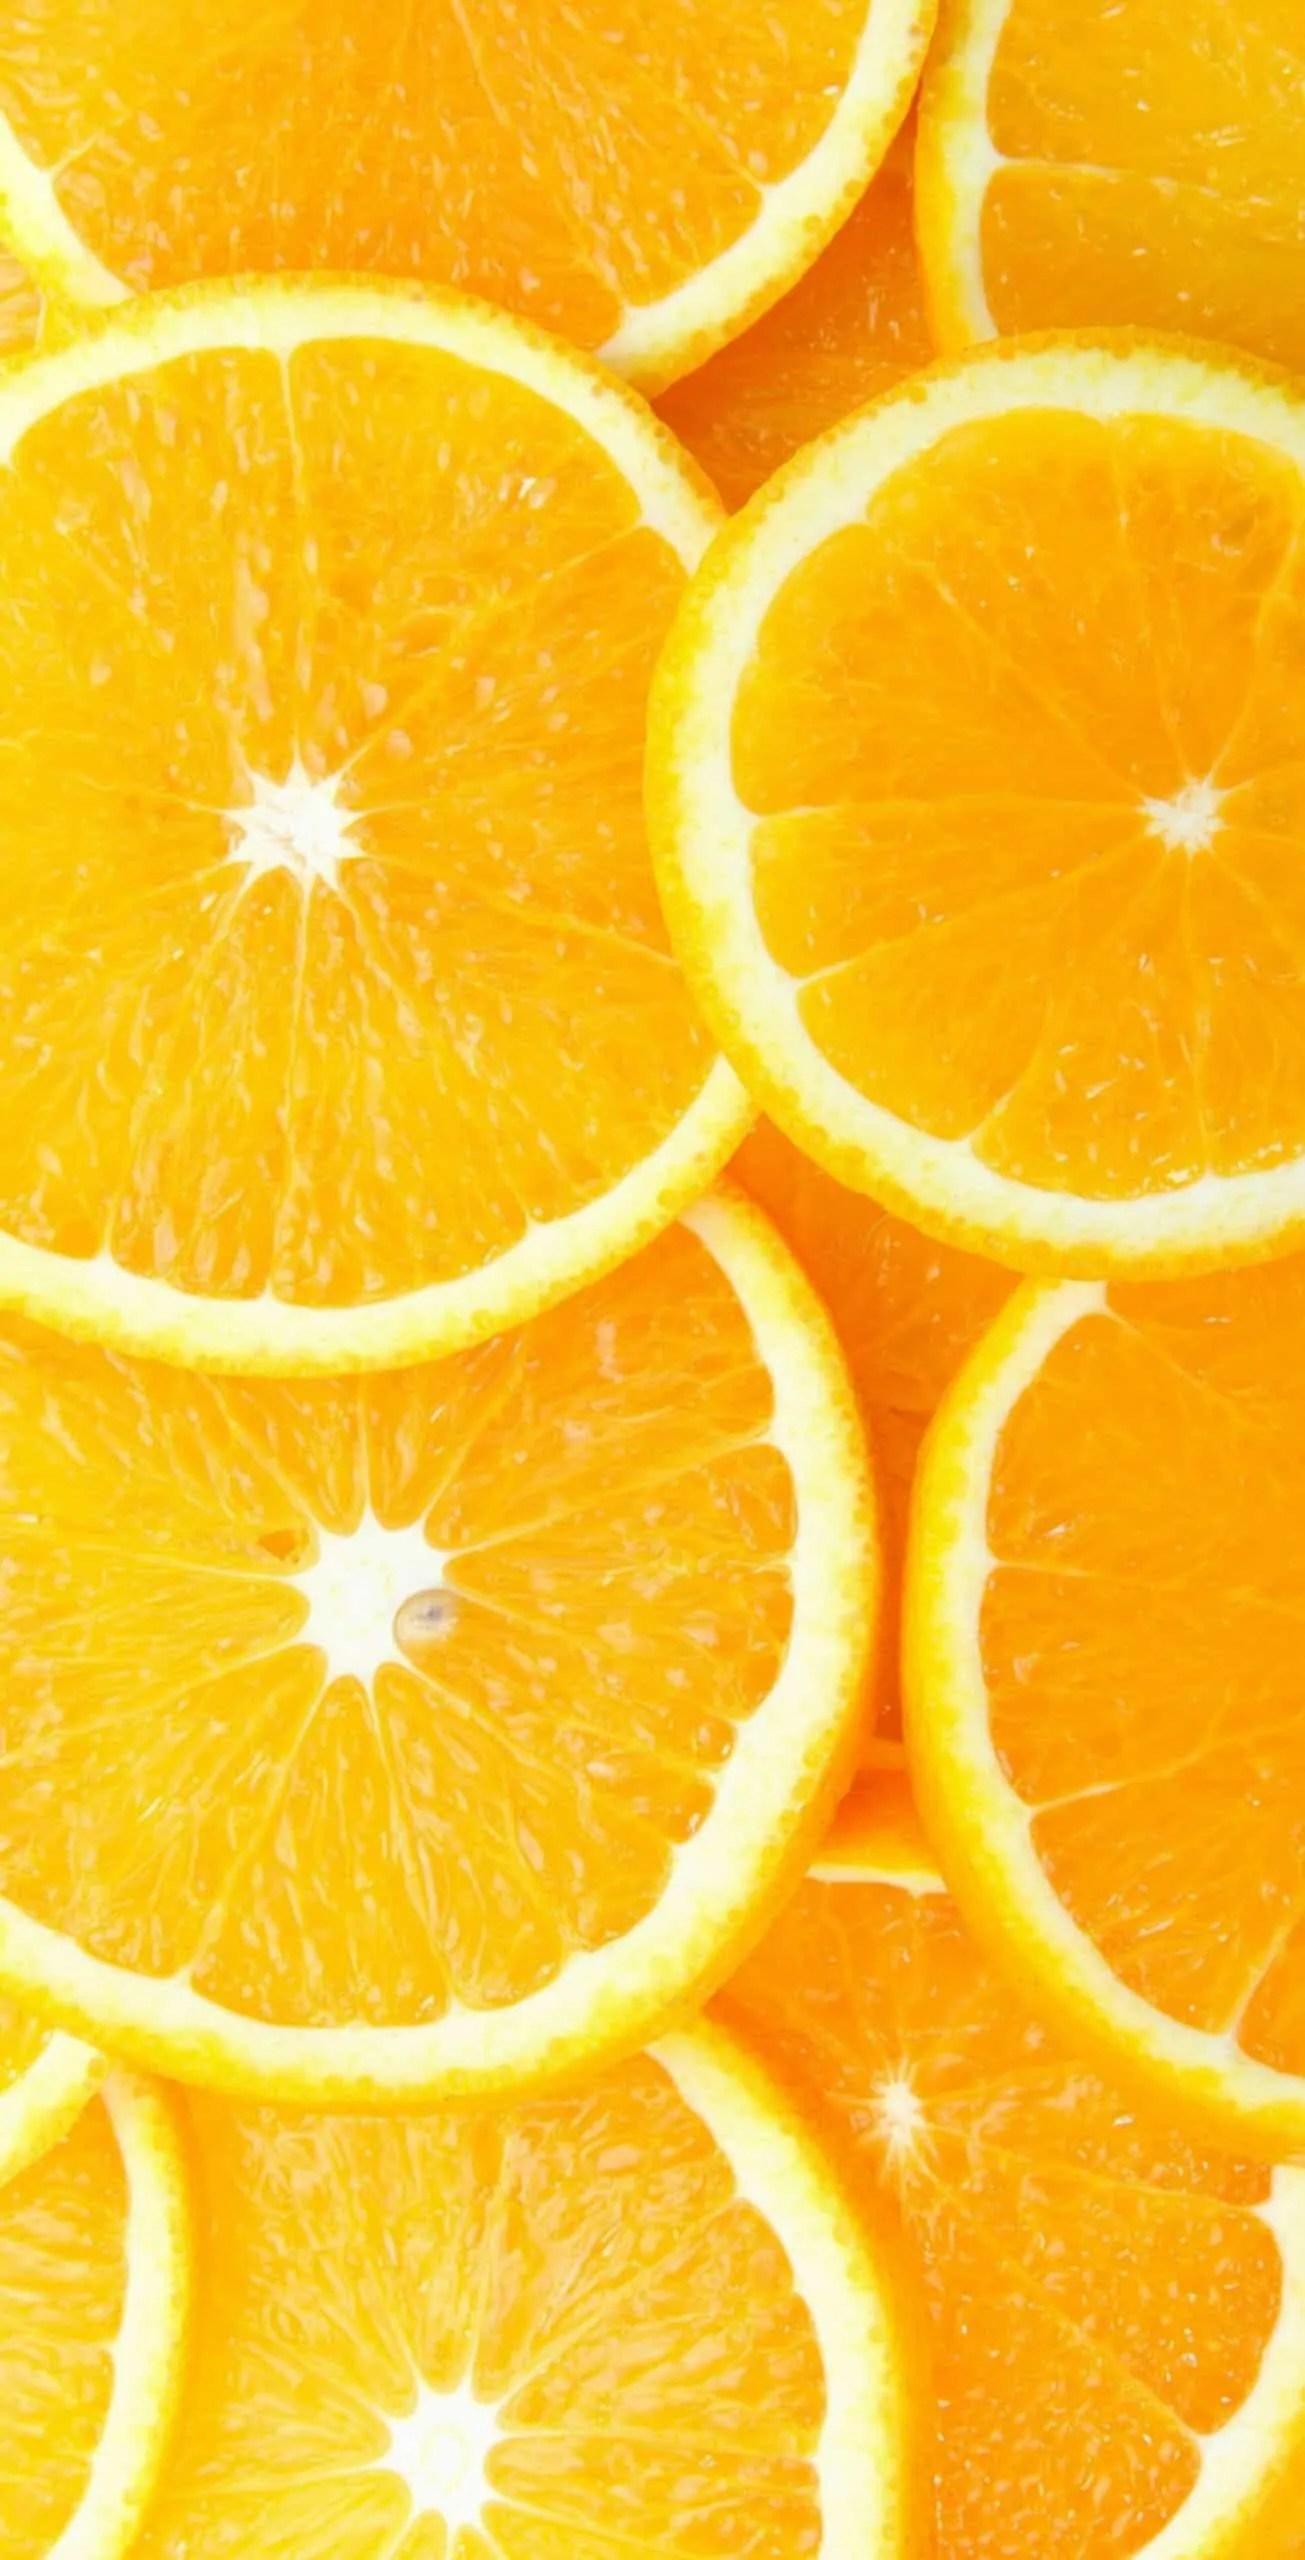 Oranges-Themed-Cornhole-Board-Prints-_-Wraps-Corn-Hole-Wraps-Bag-Toss-Corn-Toss-Custom 5